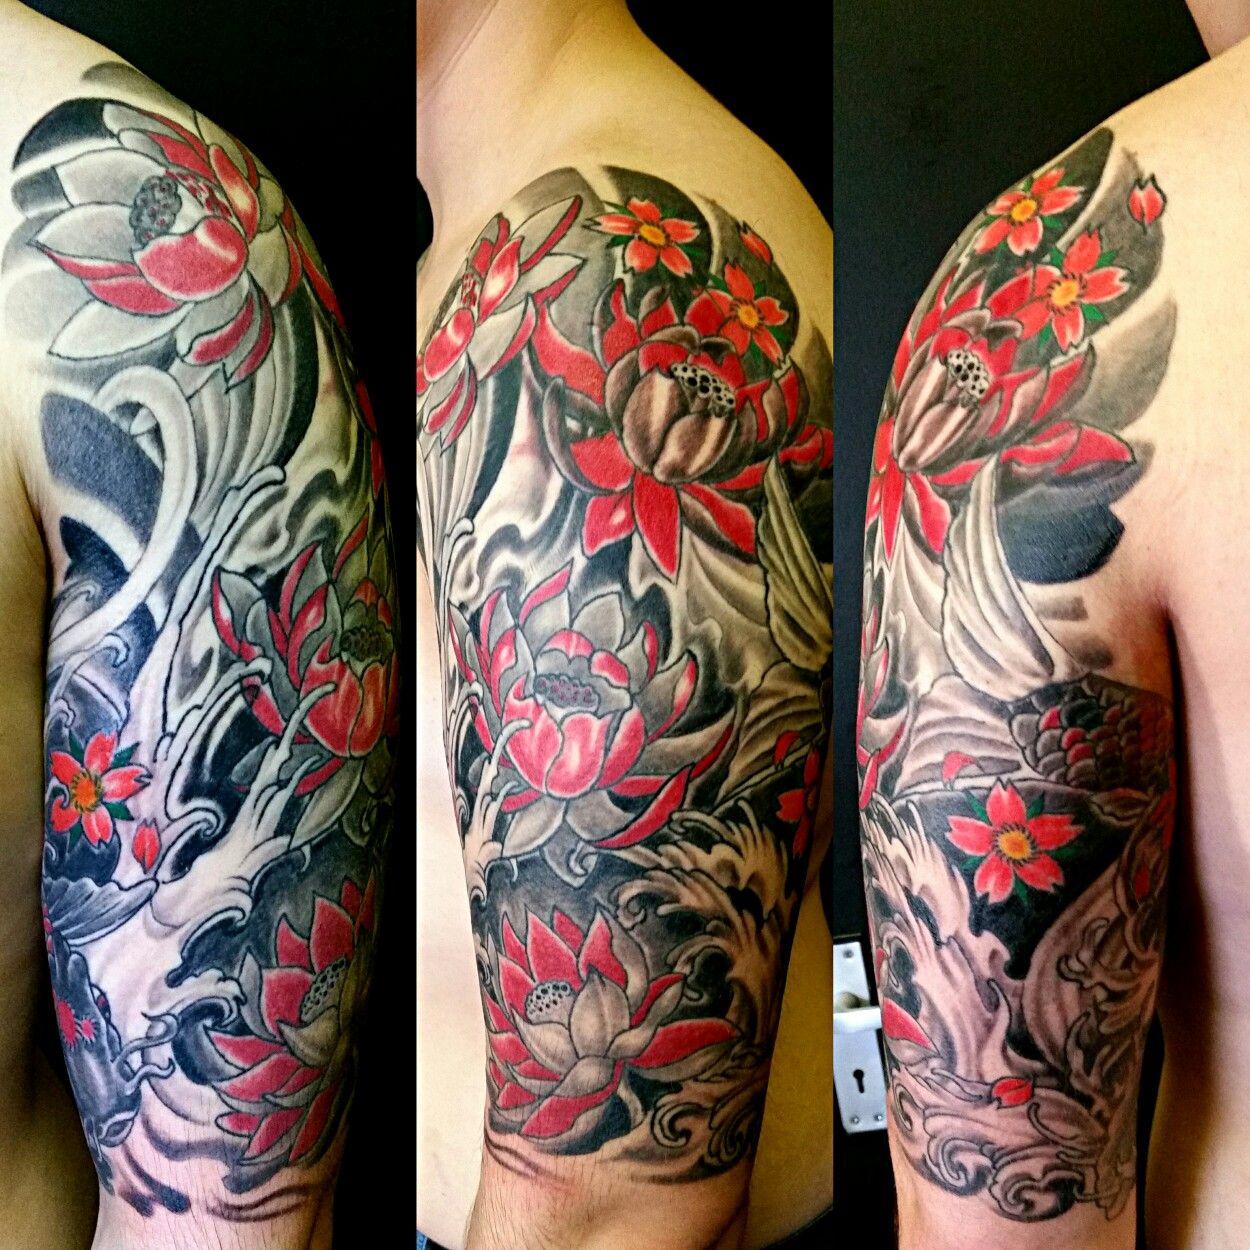 Top Arm Part Of Irezumi Traditional Japanese Half Sleeve Freehand regarding size 1250 X 1250